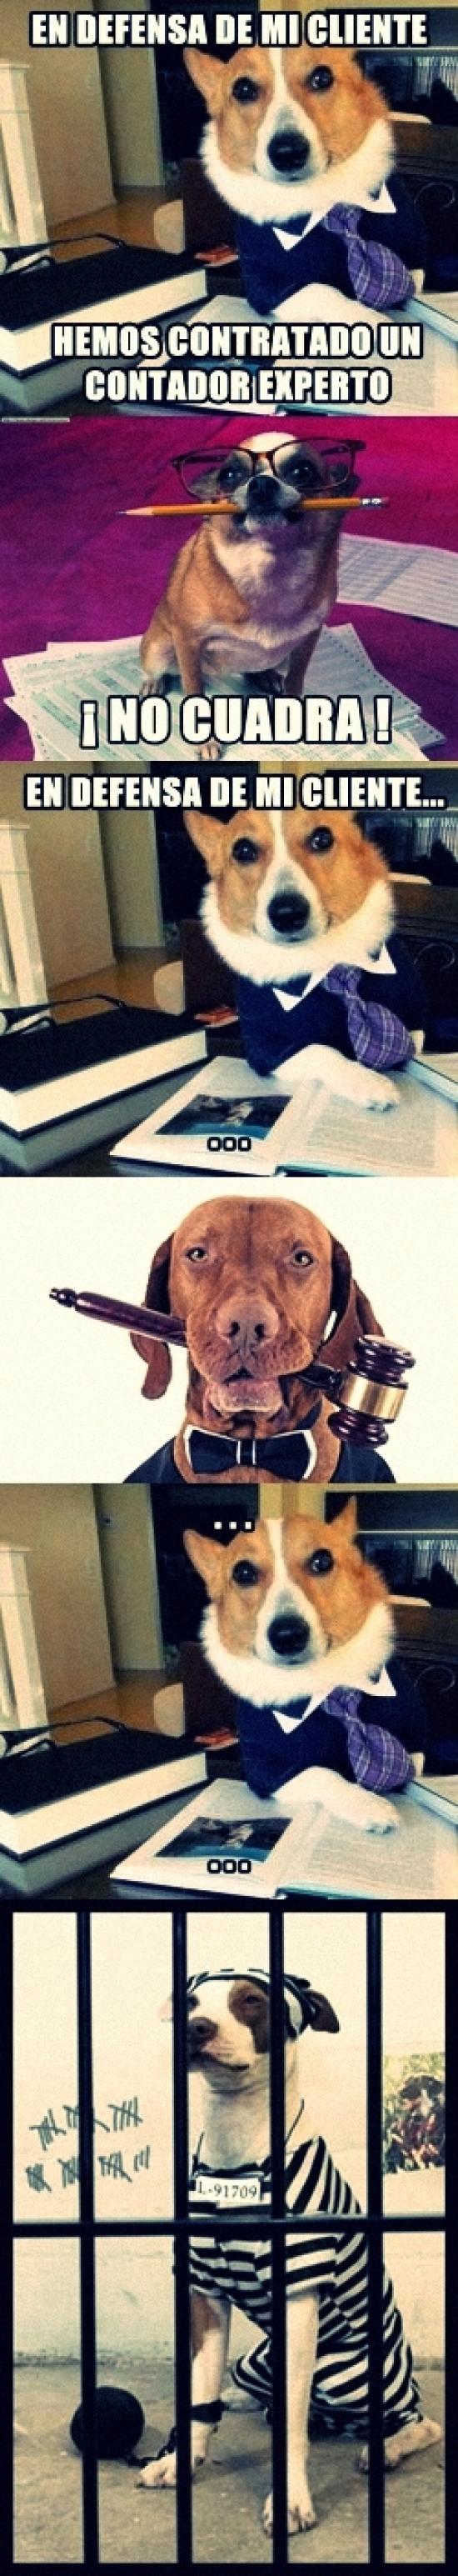 Meme_otros - Juicio canino